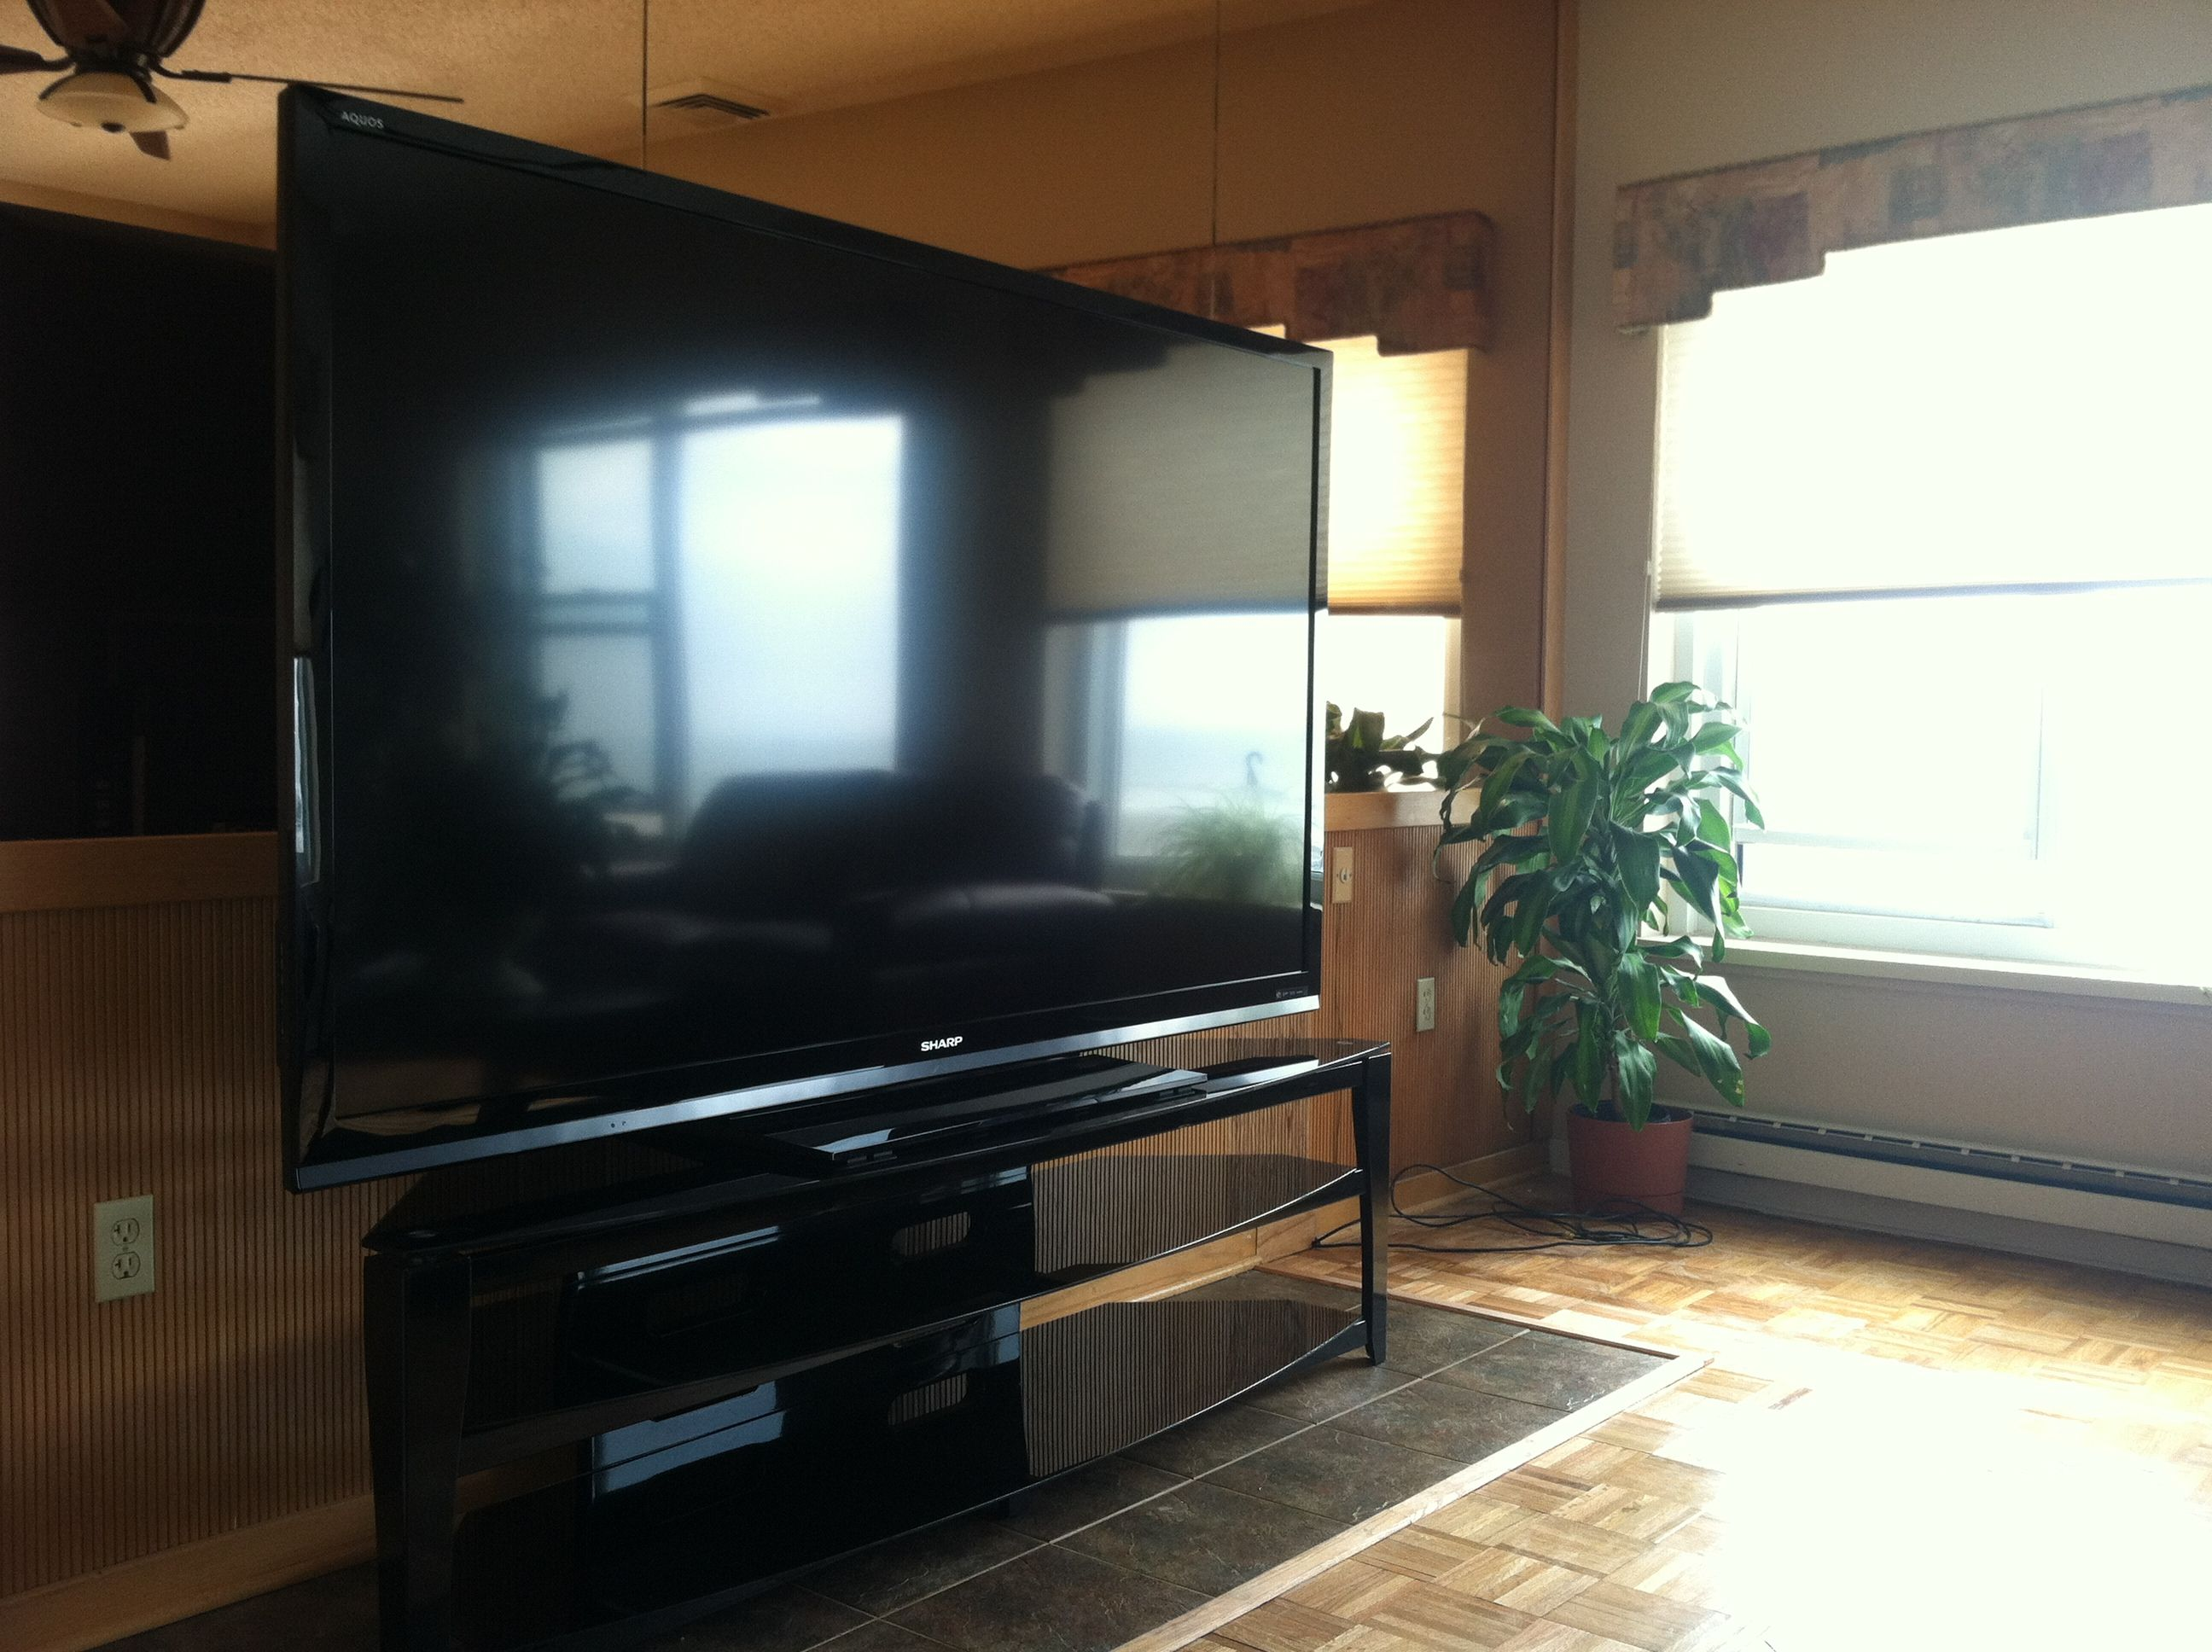 Attirant Large Living Room Ideas With Tv